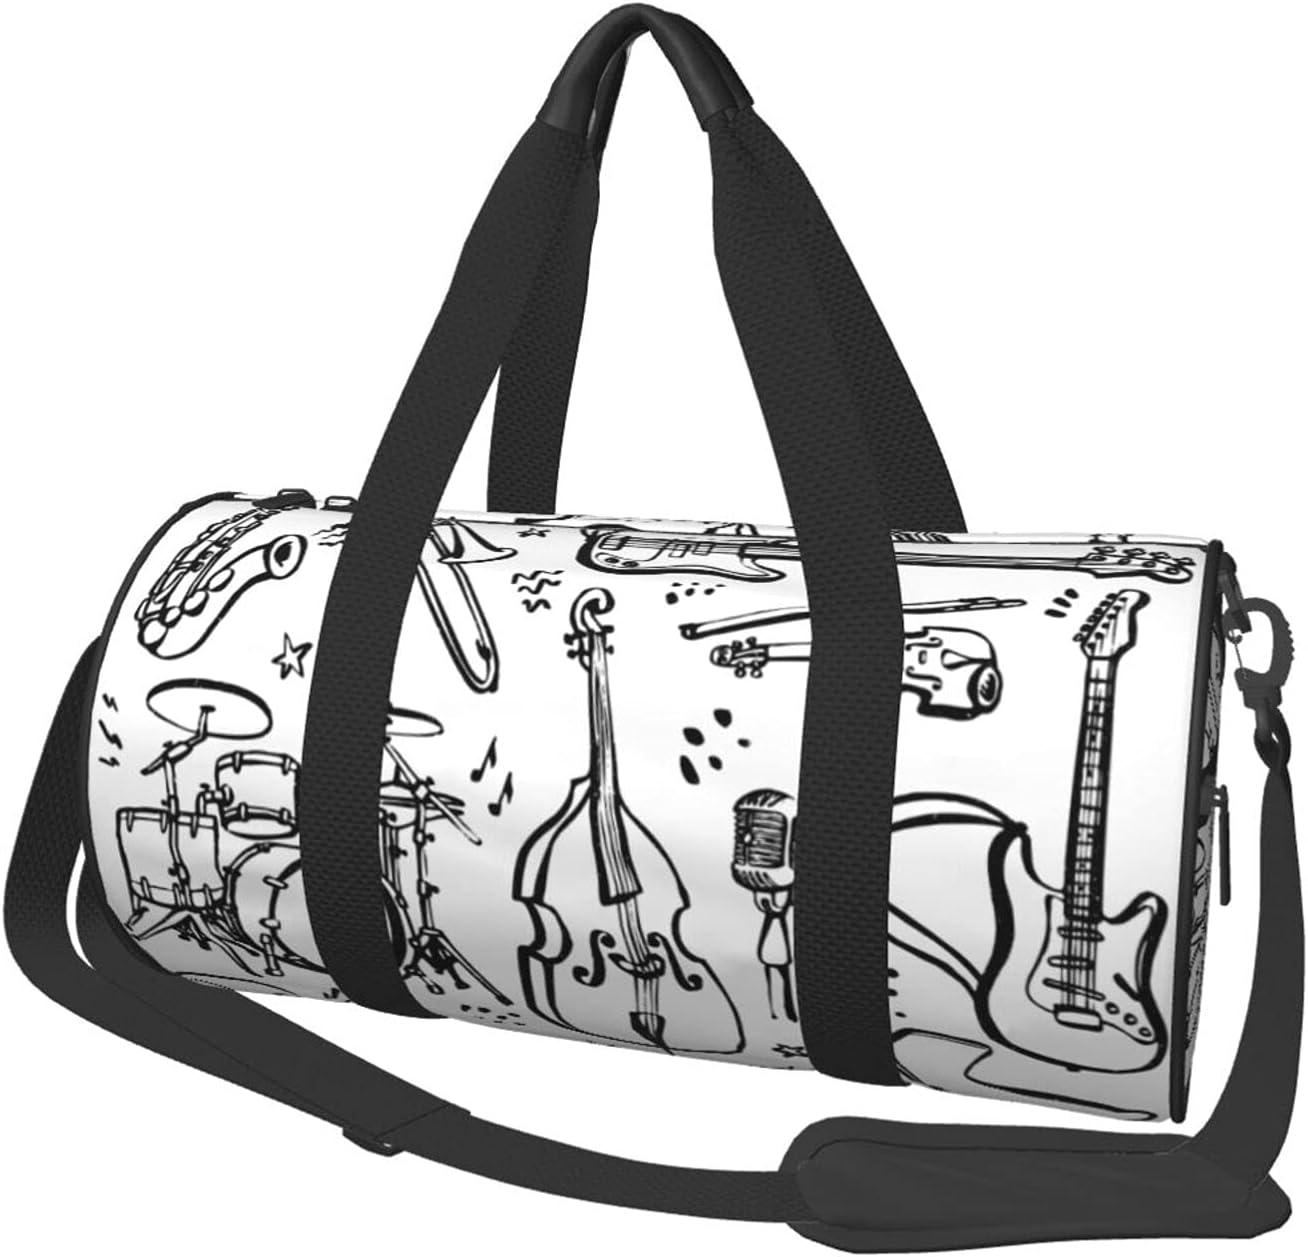 Fredeulva Hand Drawn Music 5% OFF Instruments Genuine Free Shipping Canvas Shoulde Bag Duffel